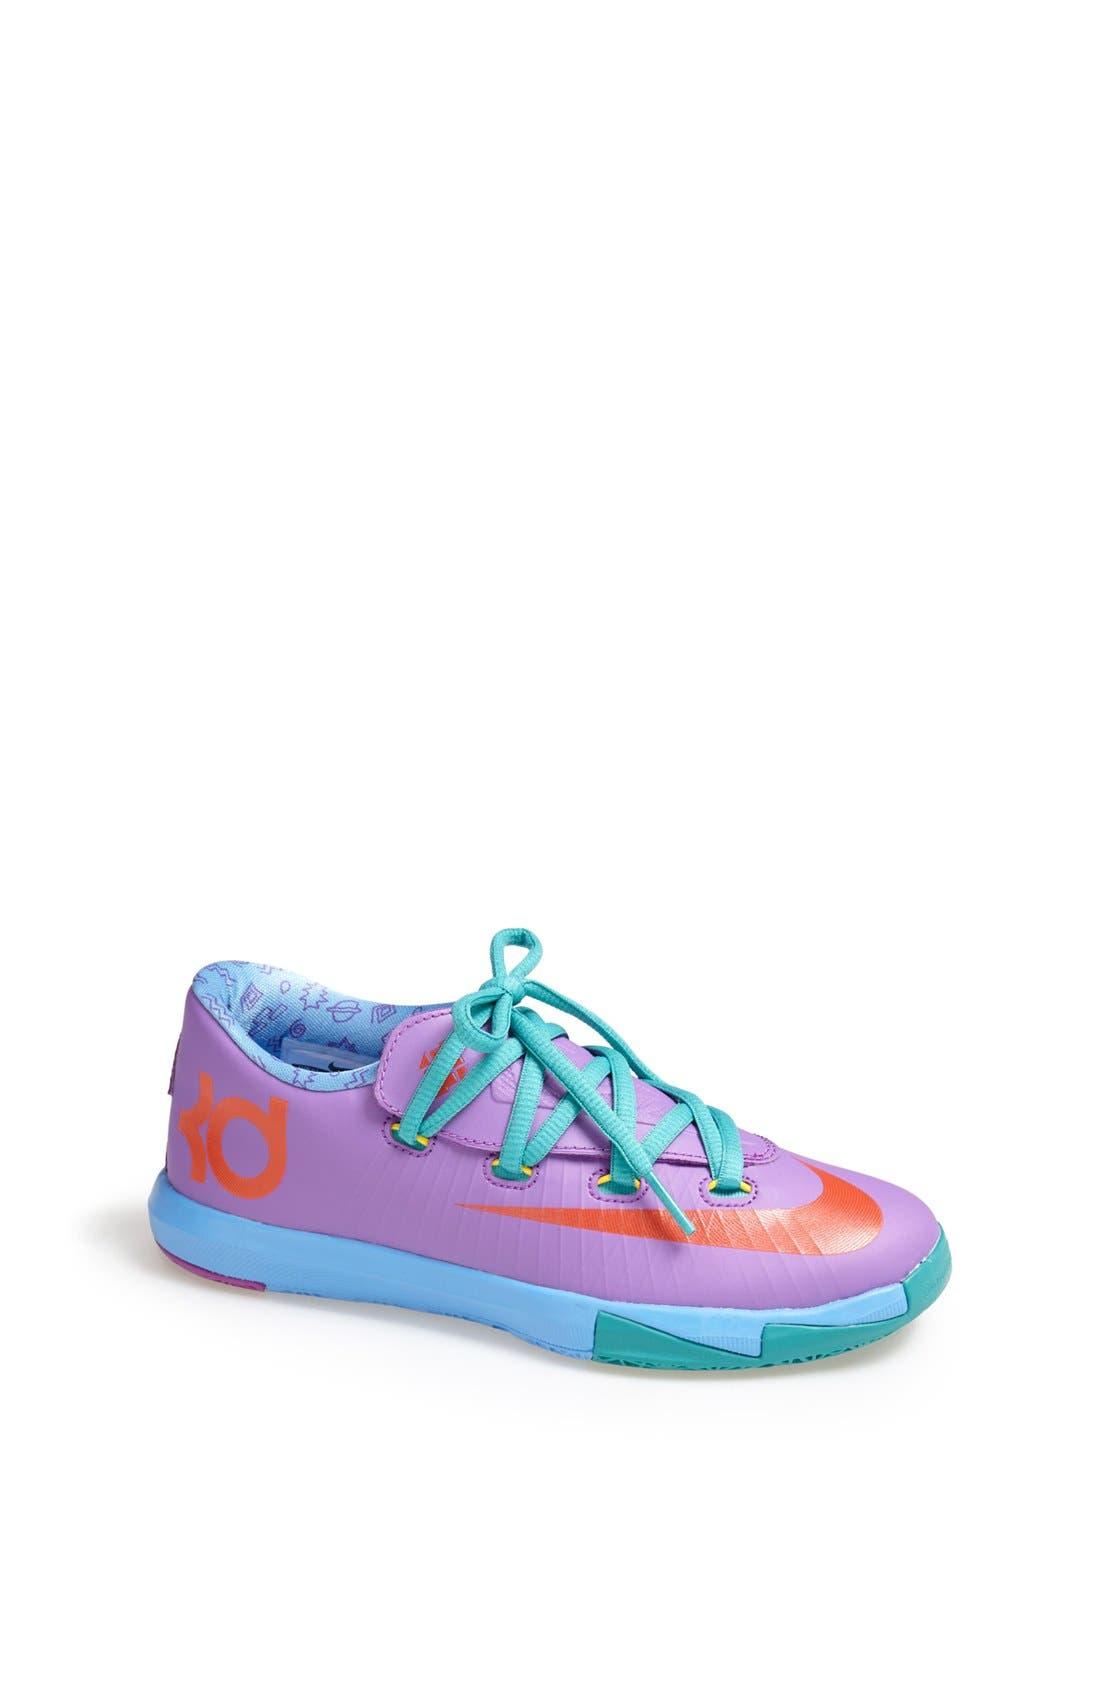 Alternate Image 1 Selected - Nike 'KD VI' Basketball Shoe (Walker, Toddler & Little Kid)